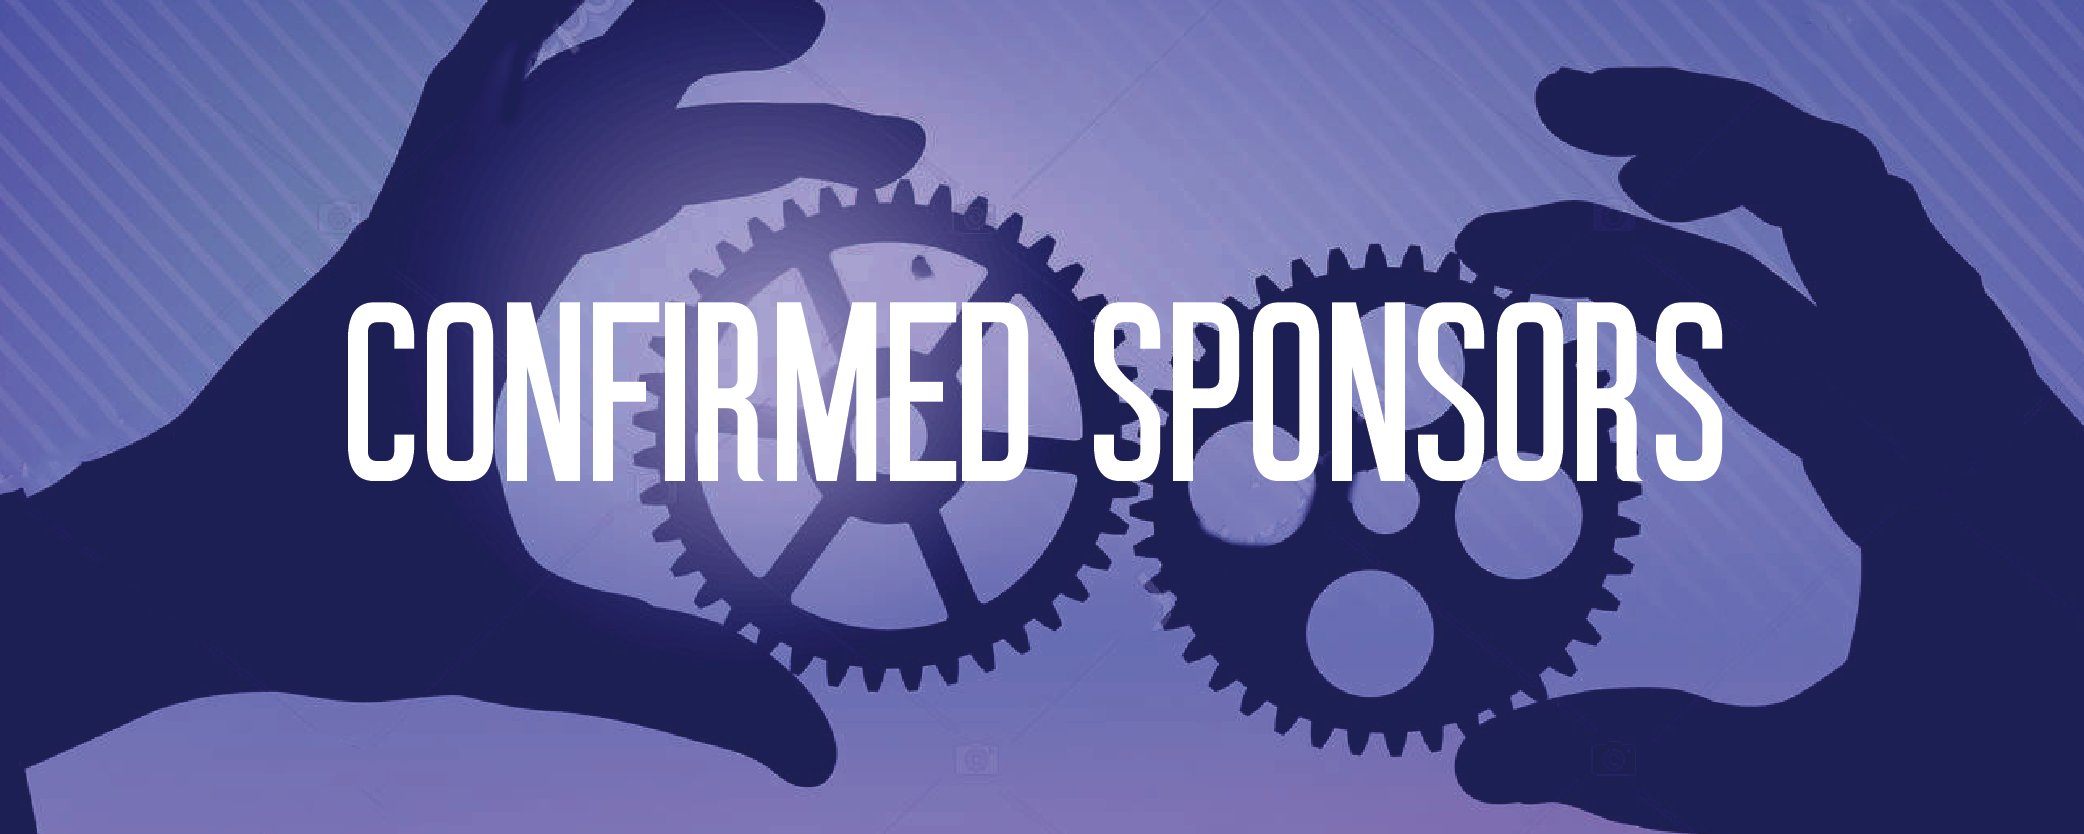 confirmed sponsors banner2-01